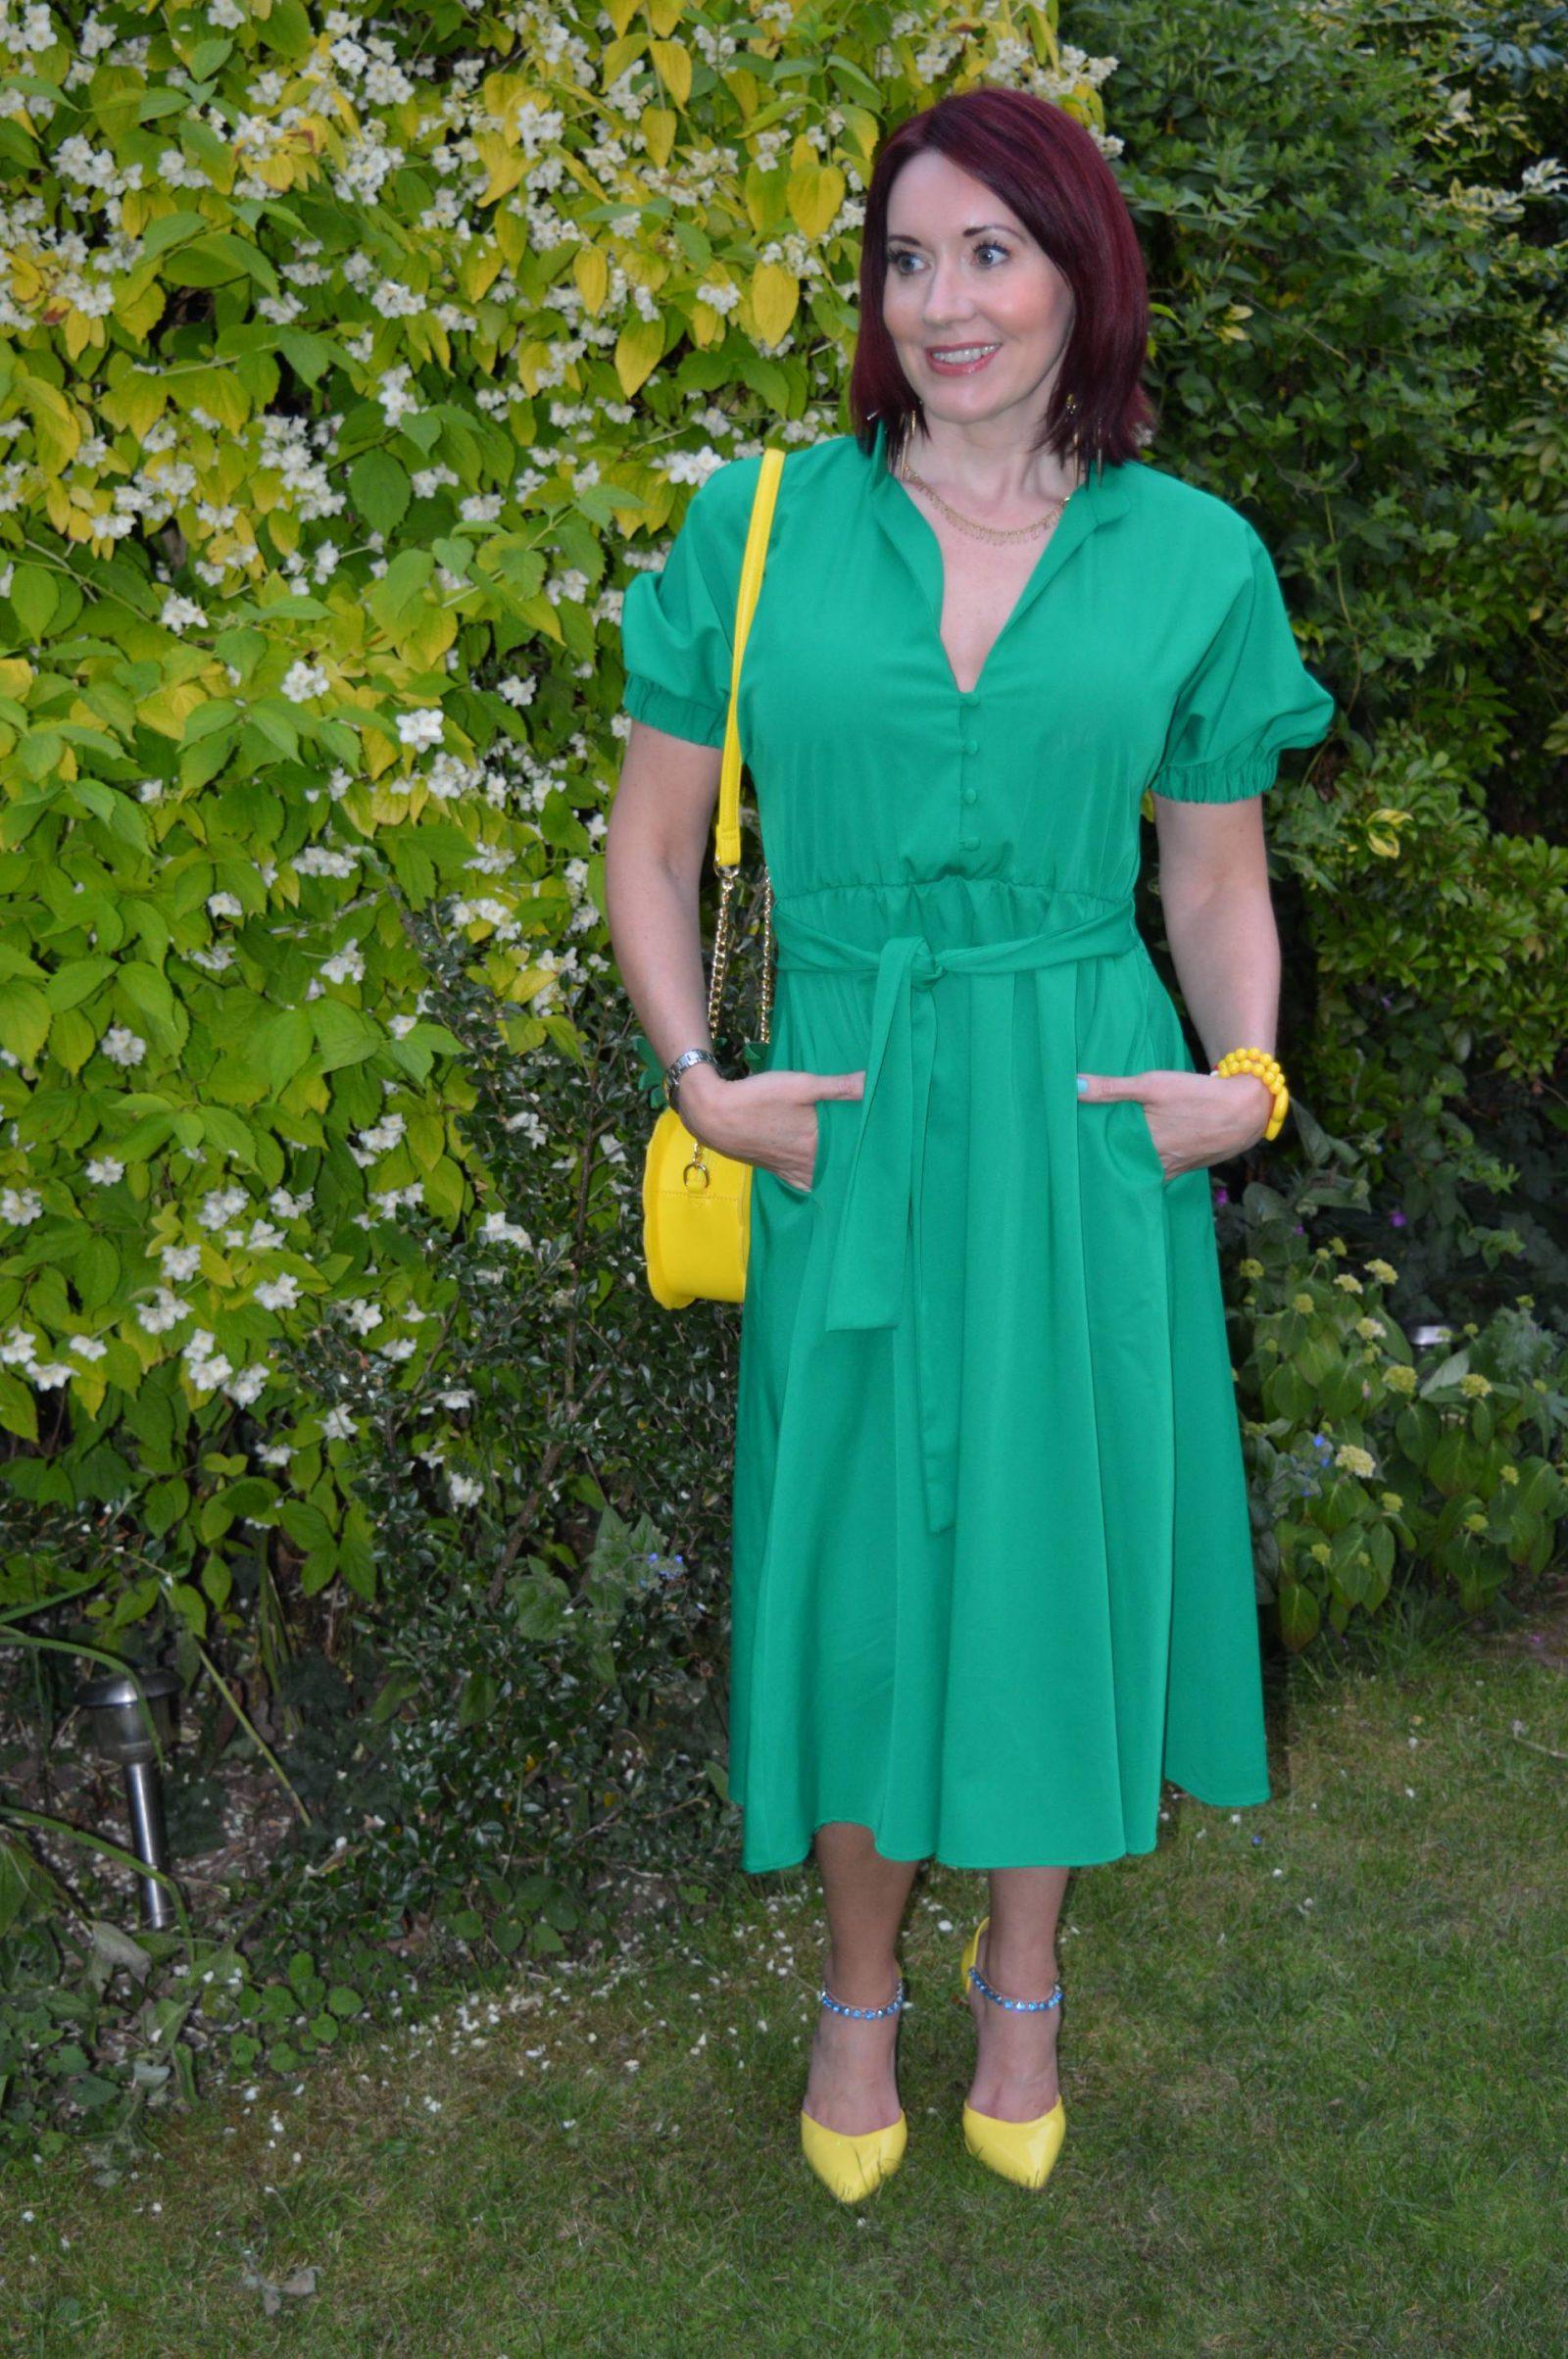 Zara Green midi dress and pineapple bag